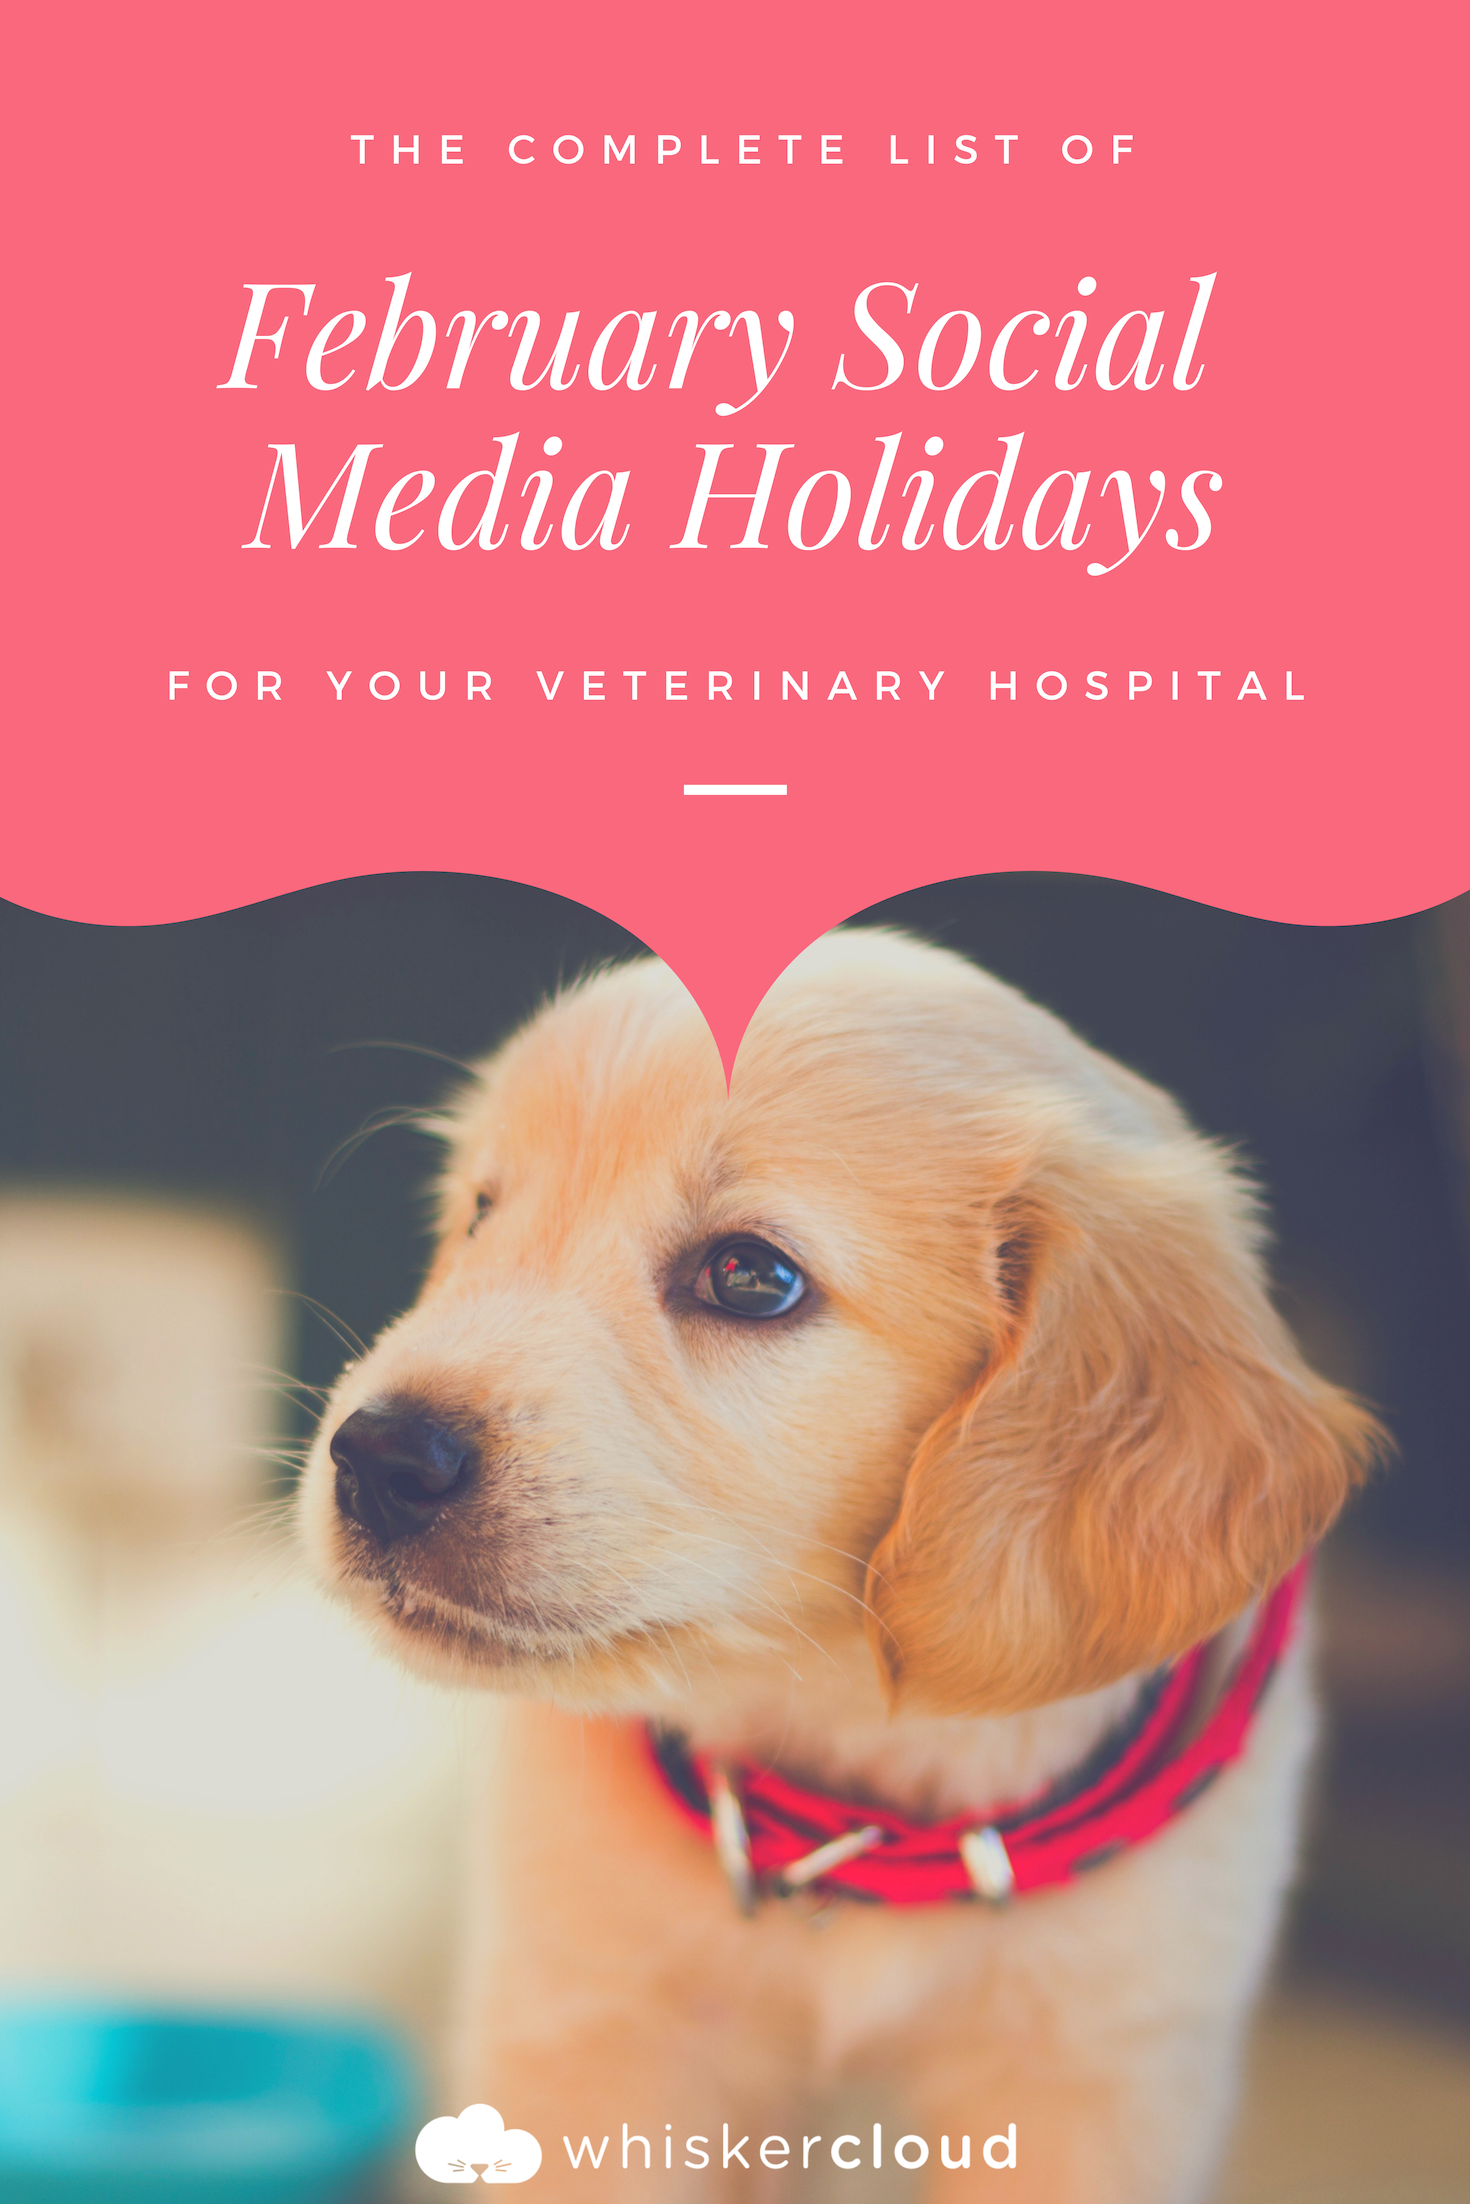 Complete List Of February Social Media Holidays For Veterinary Hospitals Veterinary Hospital Veterinary Hospital Marketing